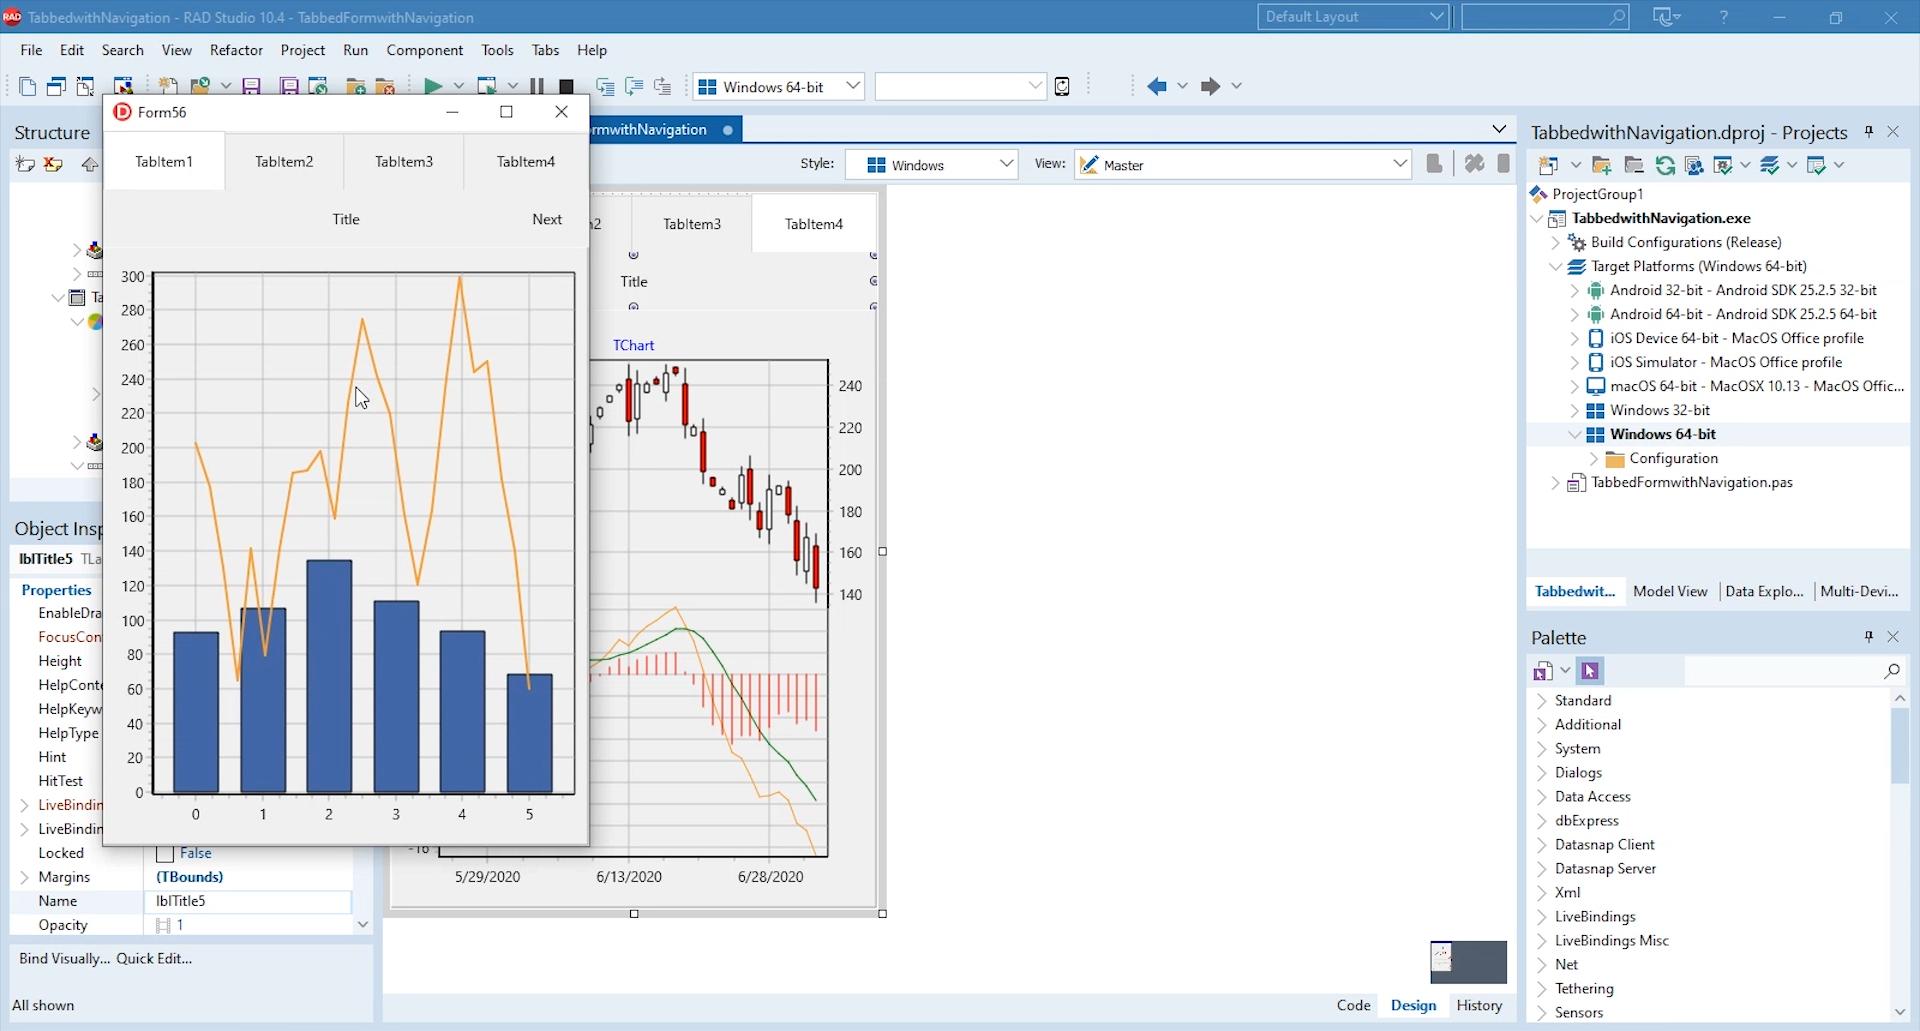 Windows 7 TeeChart Pro VCL / FMX 2021 full